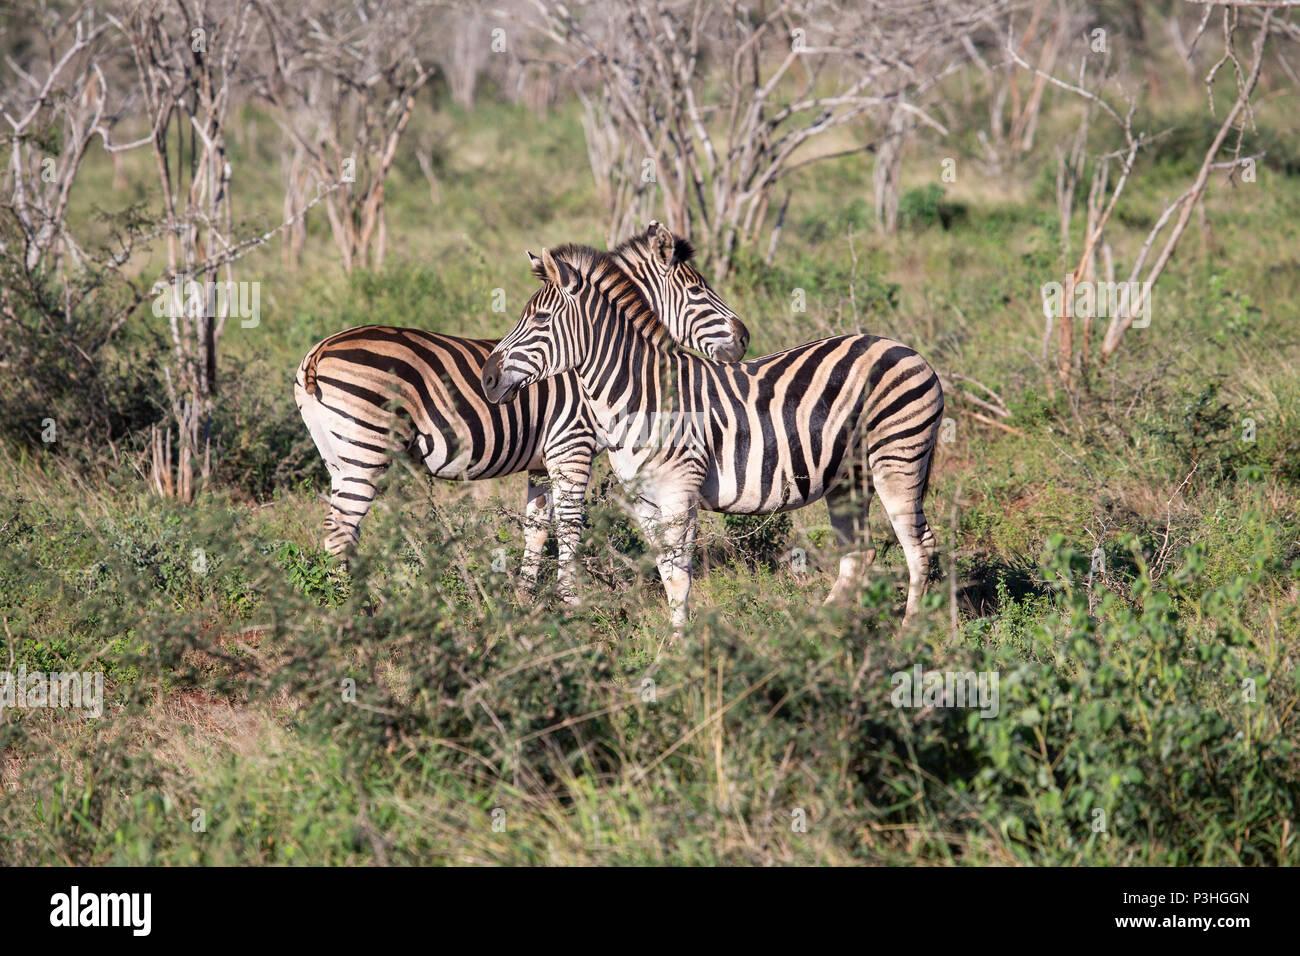 A pair of adult Zebra Equus burchellii / quagga in thick scrub in  Northern KwaZulu-Natal, South Africa - Stock Image